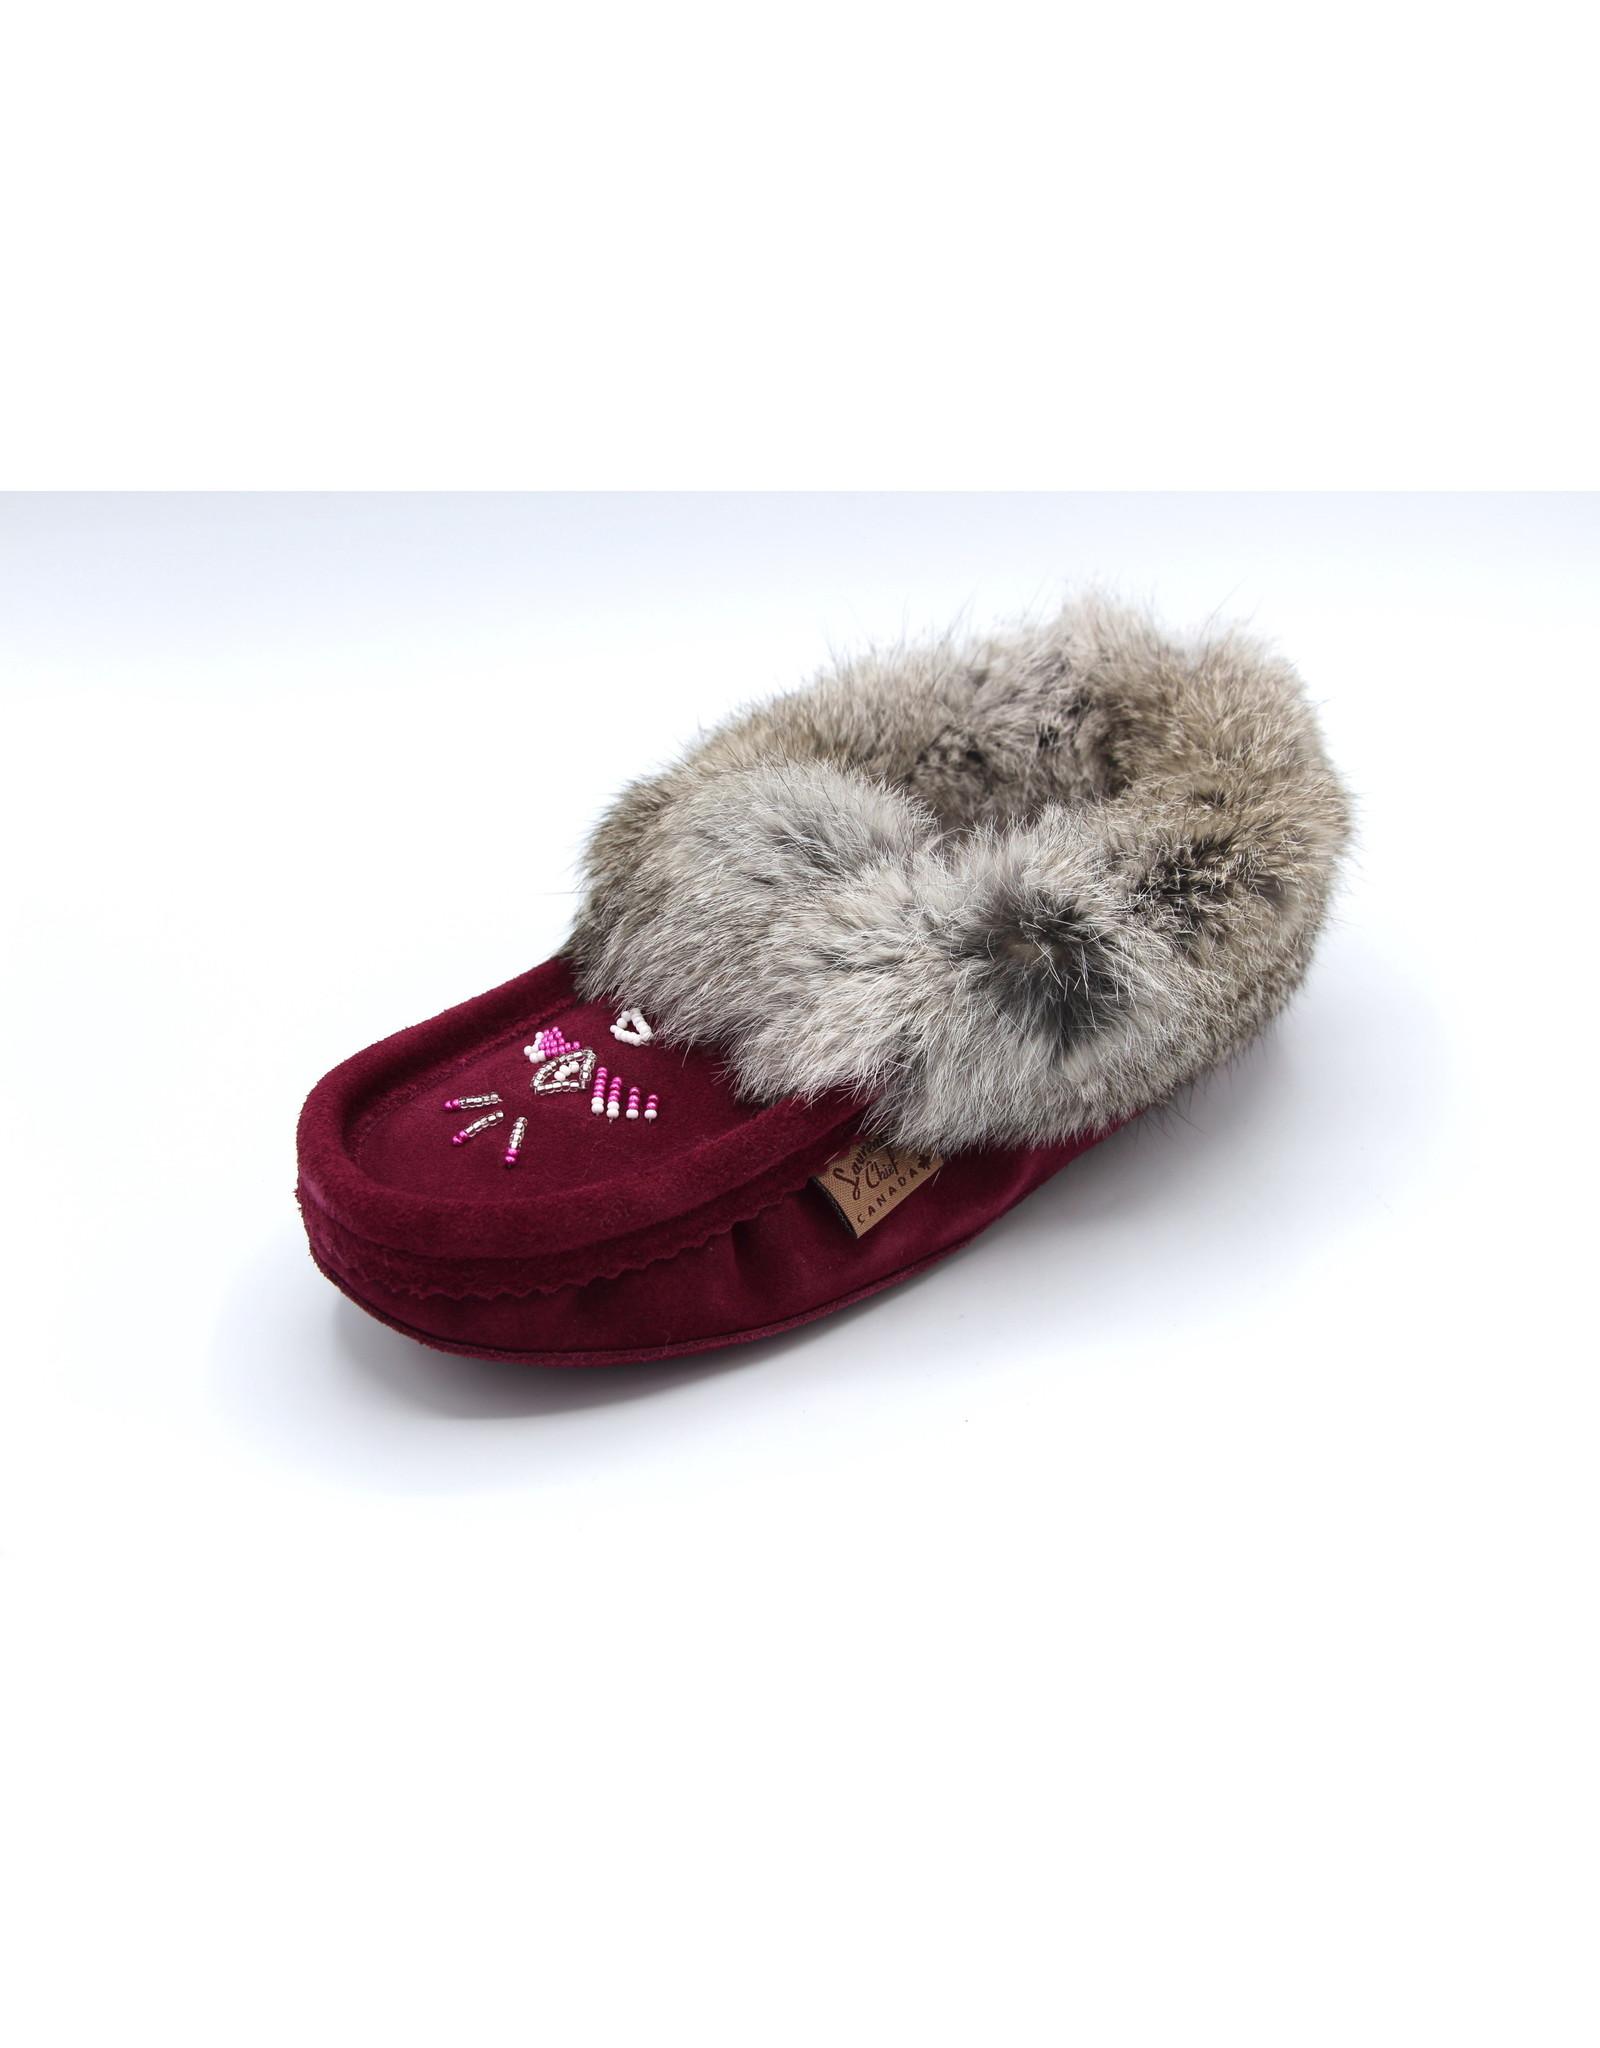 Ladies Bordeaux Suede Fur Moccasin Slipper 600BOL